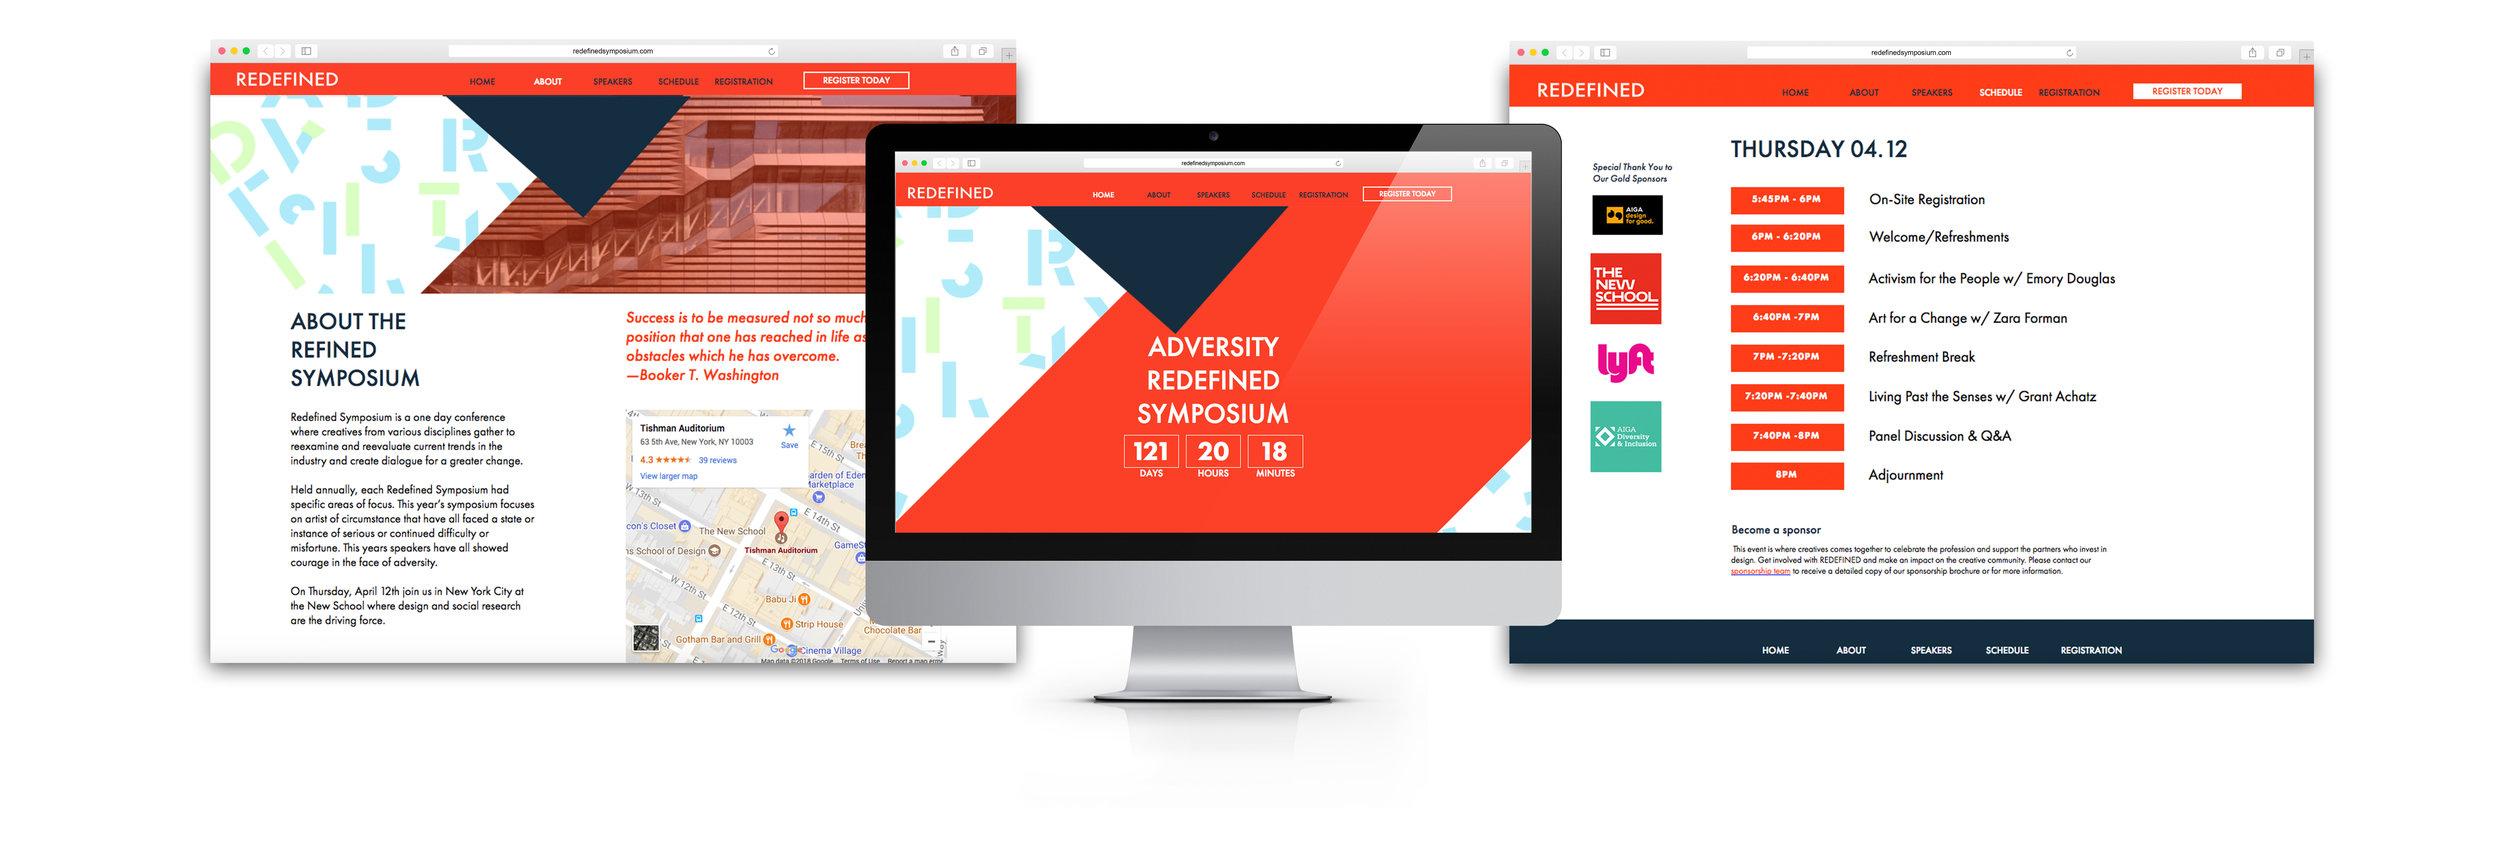 Adversity Symposium Website.jpg